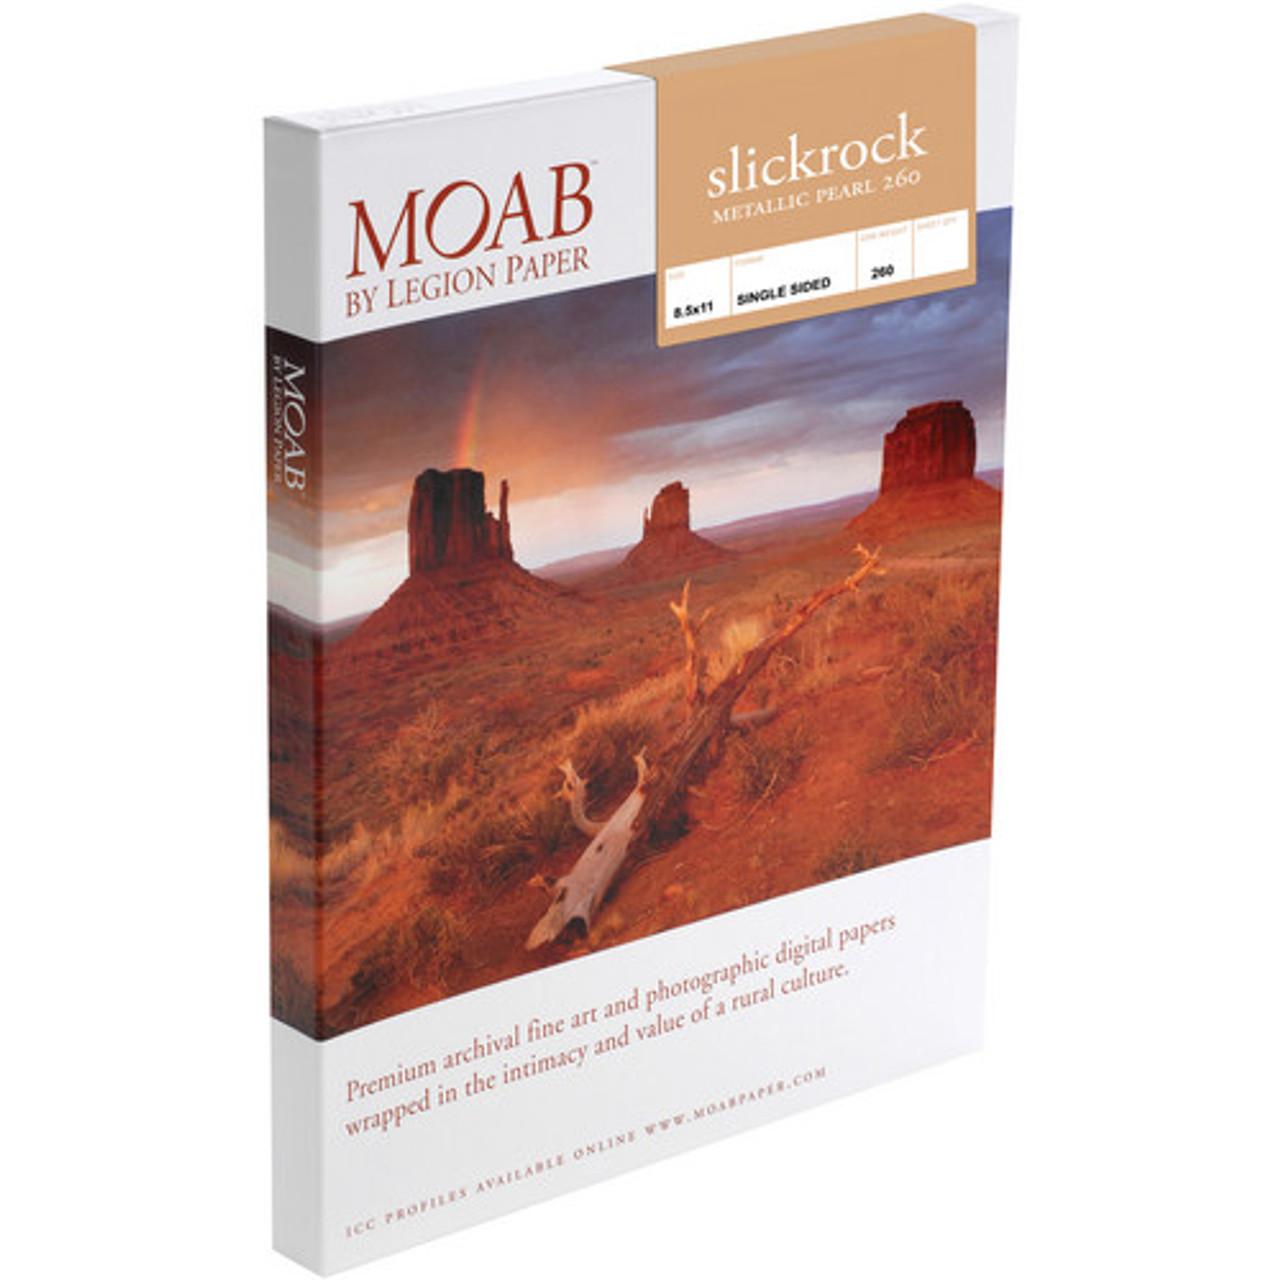 MOAB SLICKROCK METALLIC - PEARL